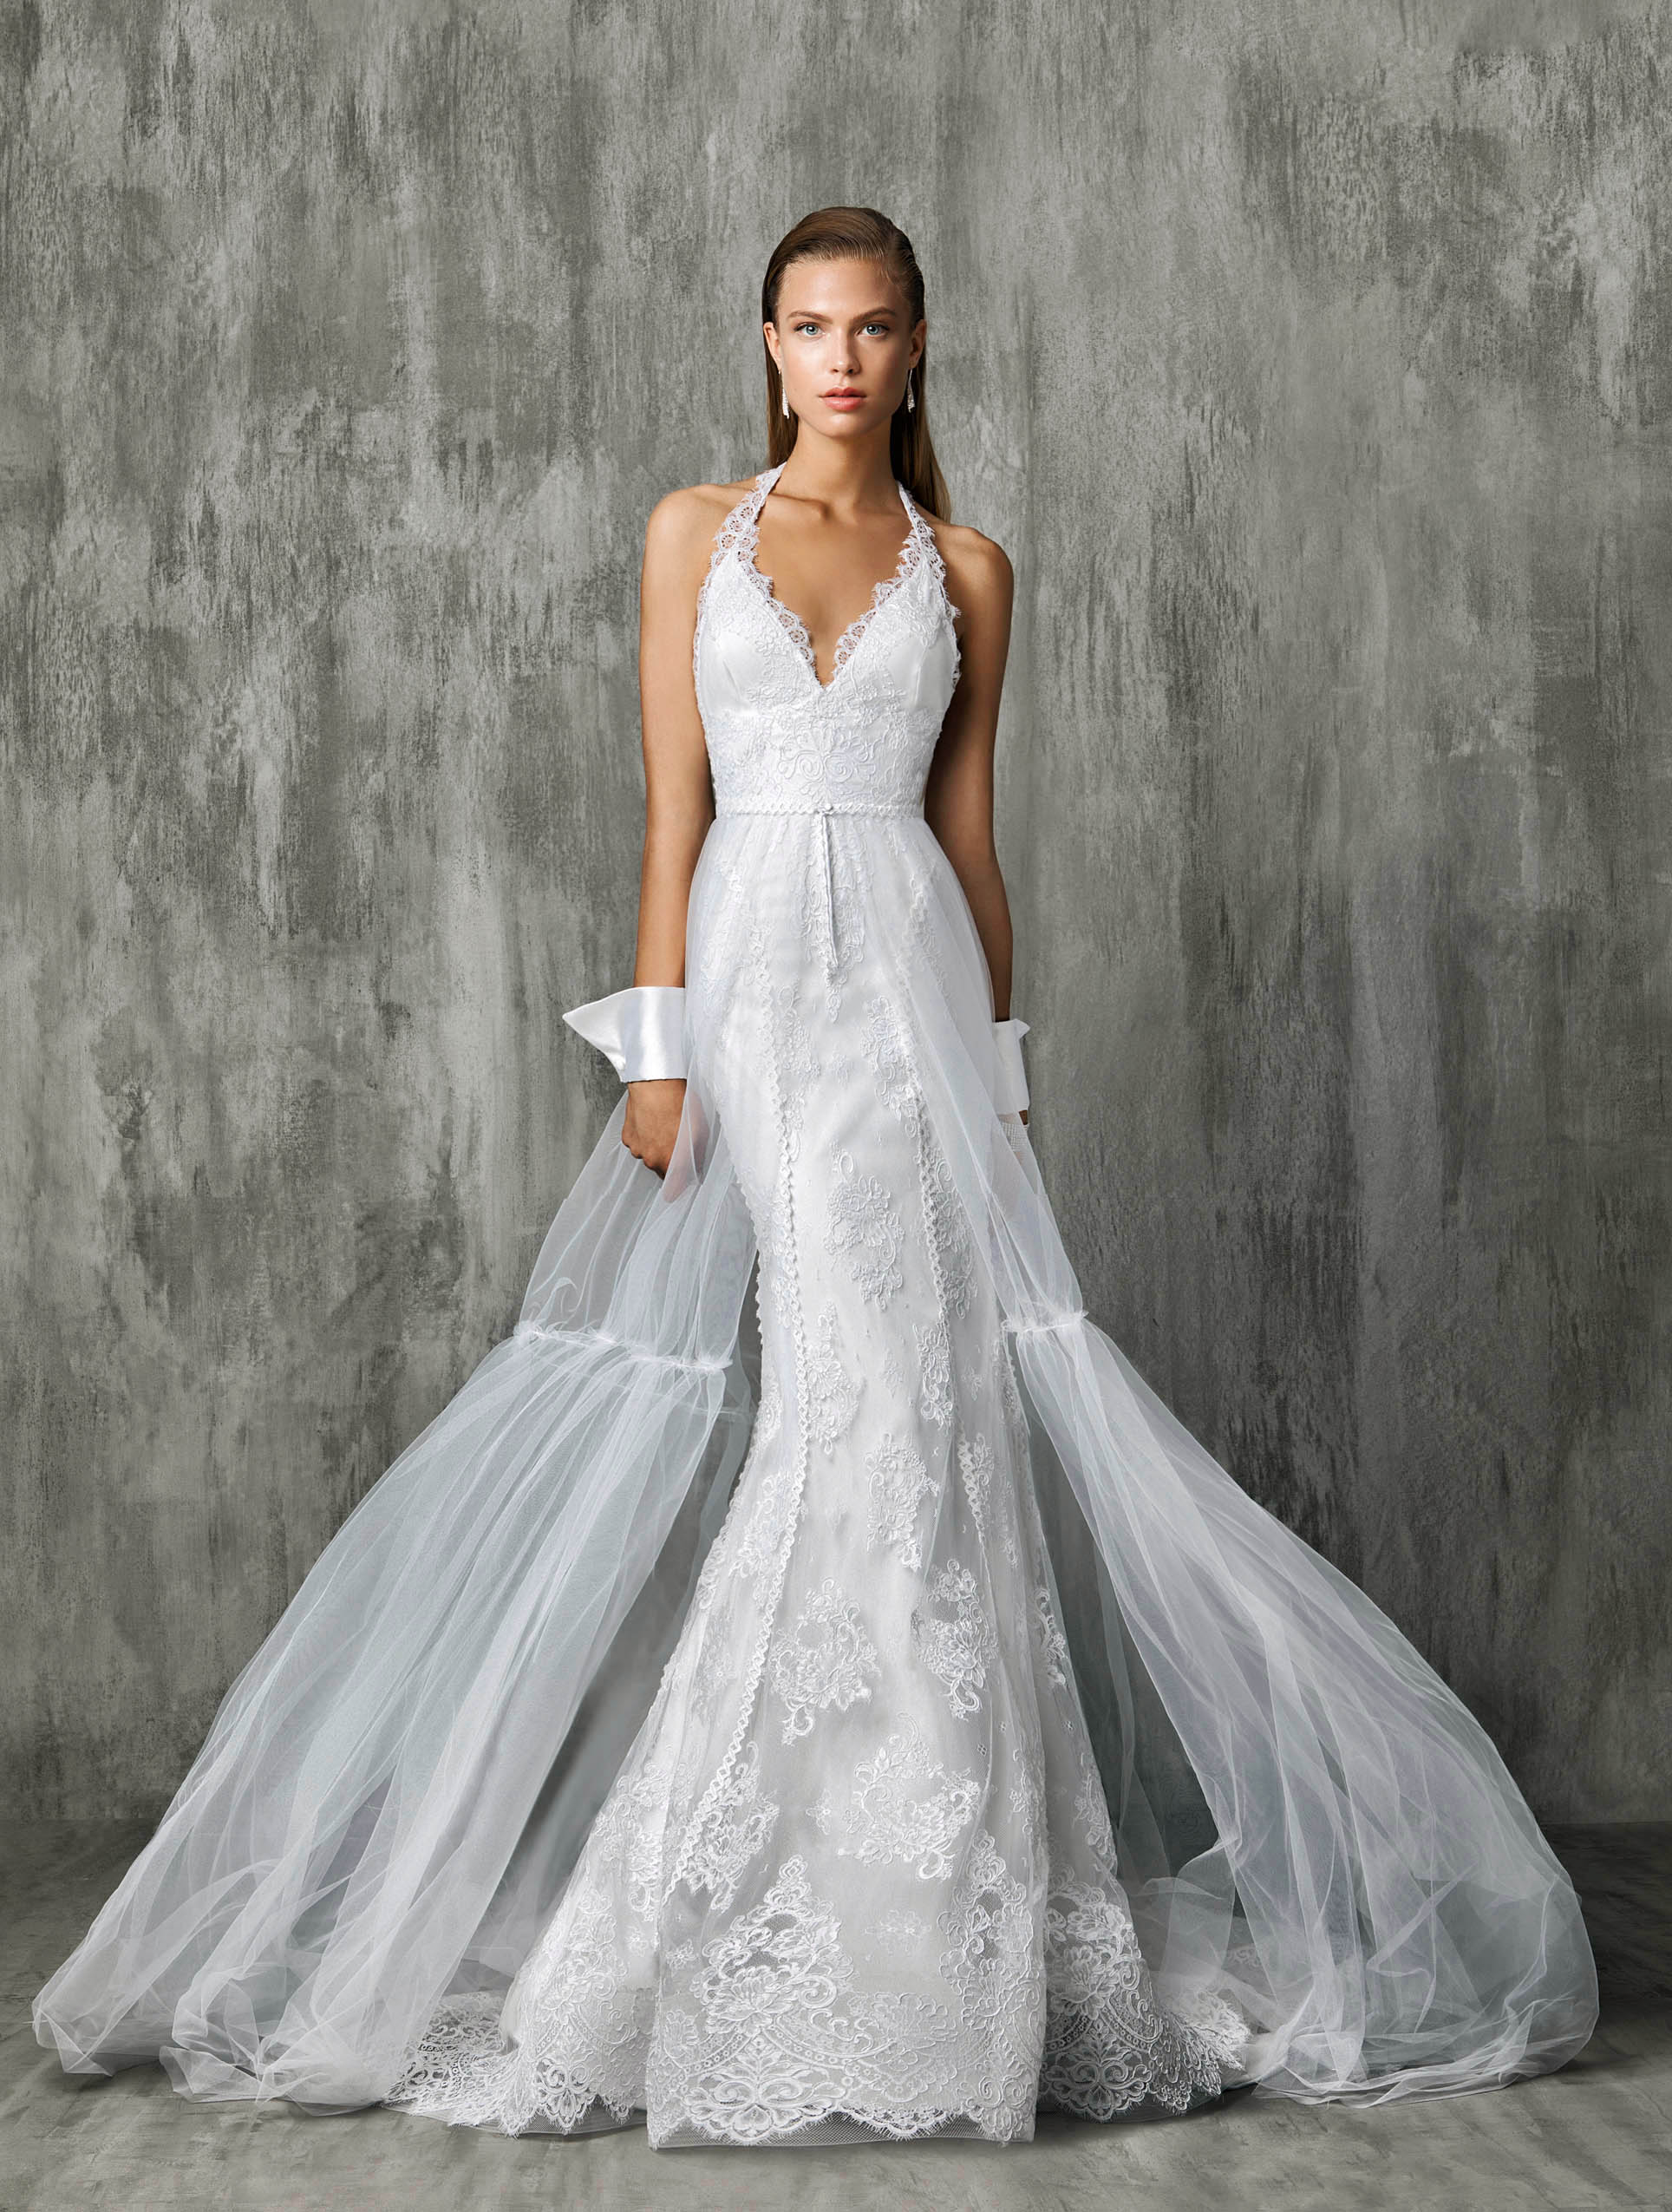 Victoria Kyriakides V-Neck with Sheer Train Wedding Dress Fall 2018